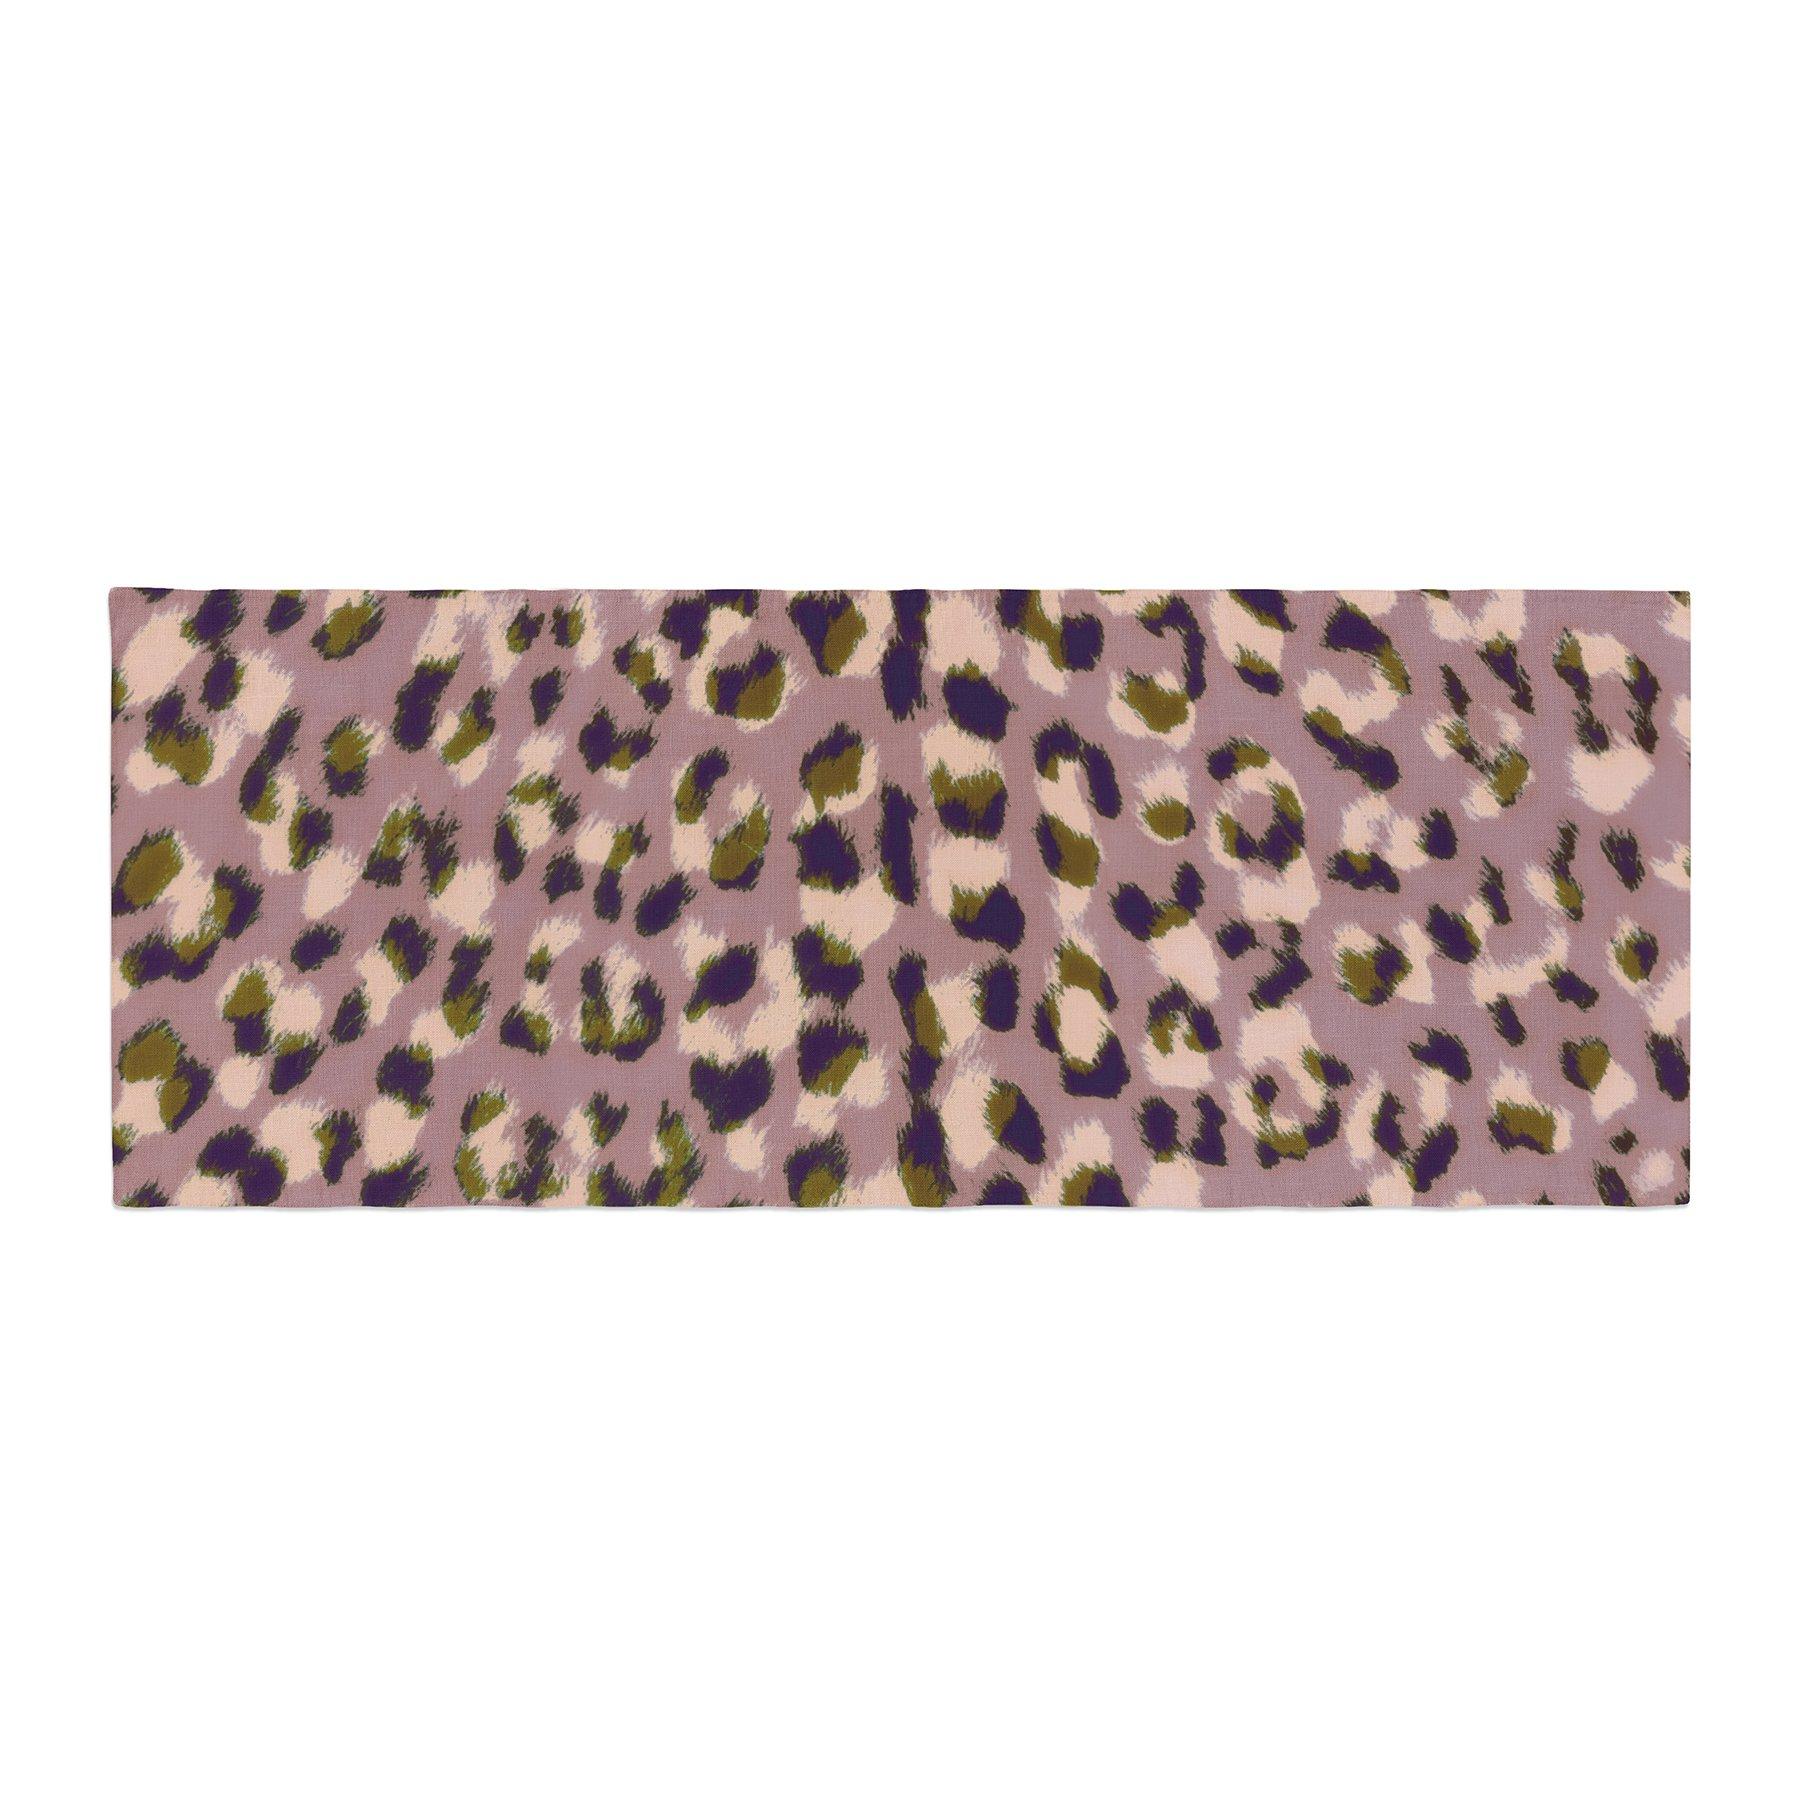 Kess InHouse Vasare Nar Leo Cheetah Animal Pattern Bed Runner, 34'' x 86''